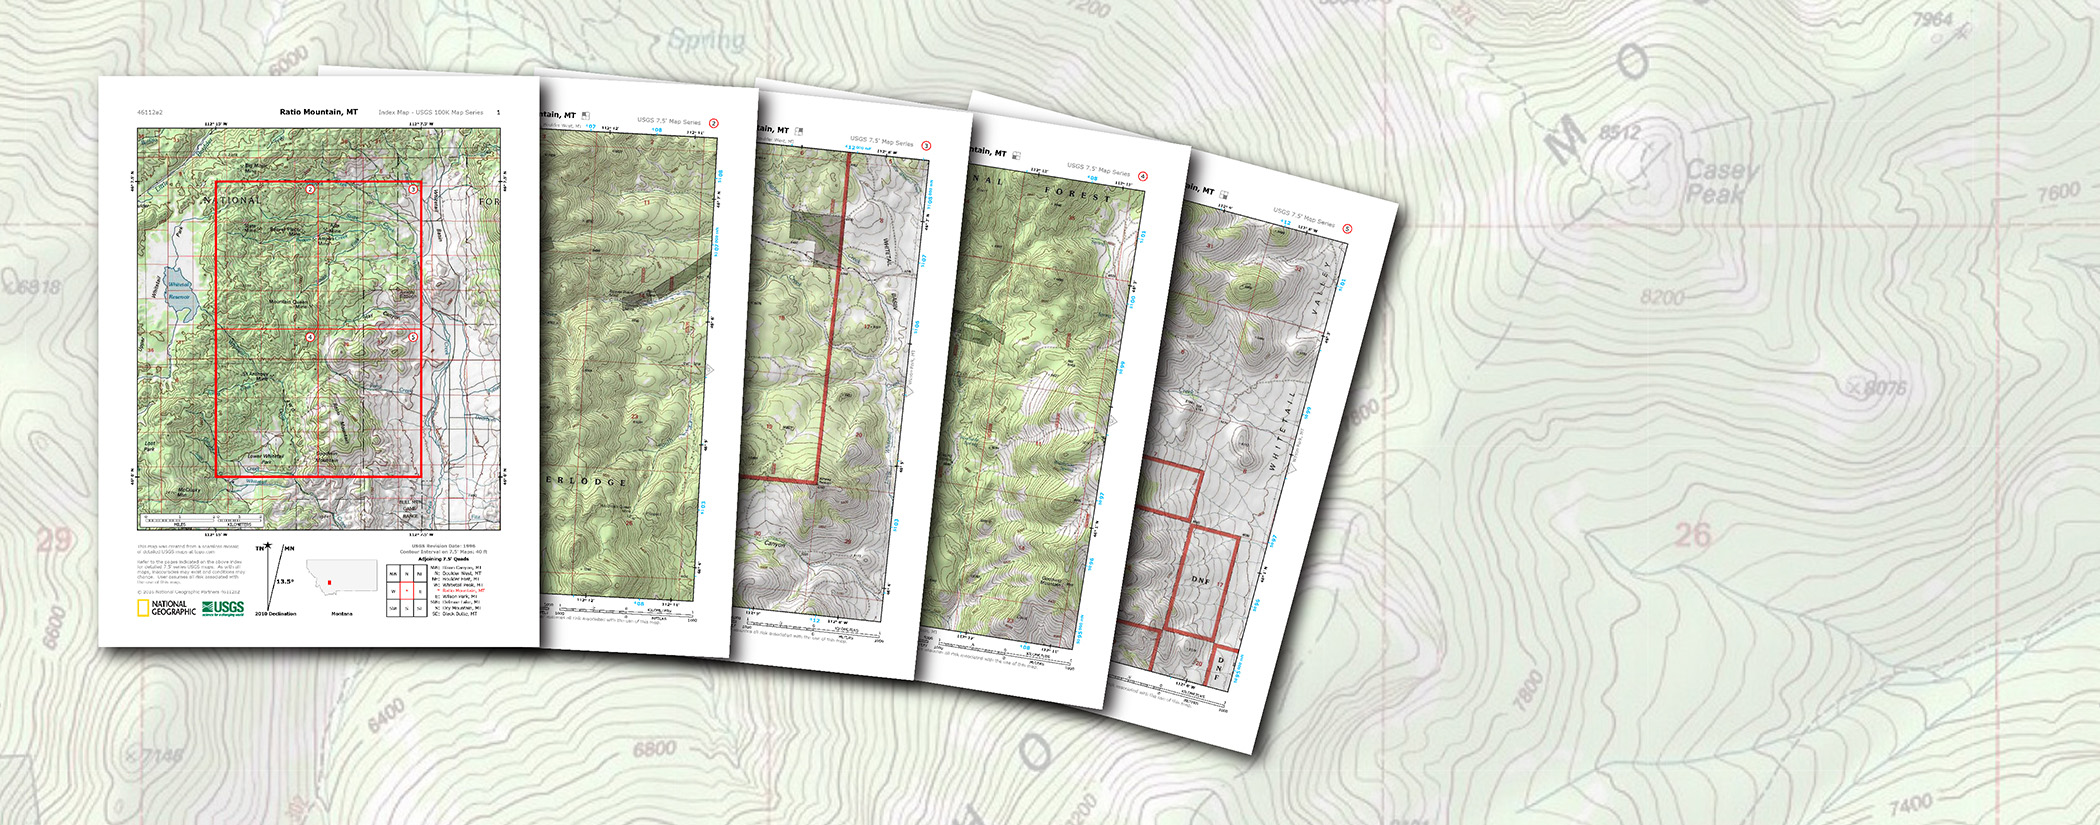 USGS PDF Quads